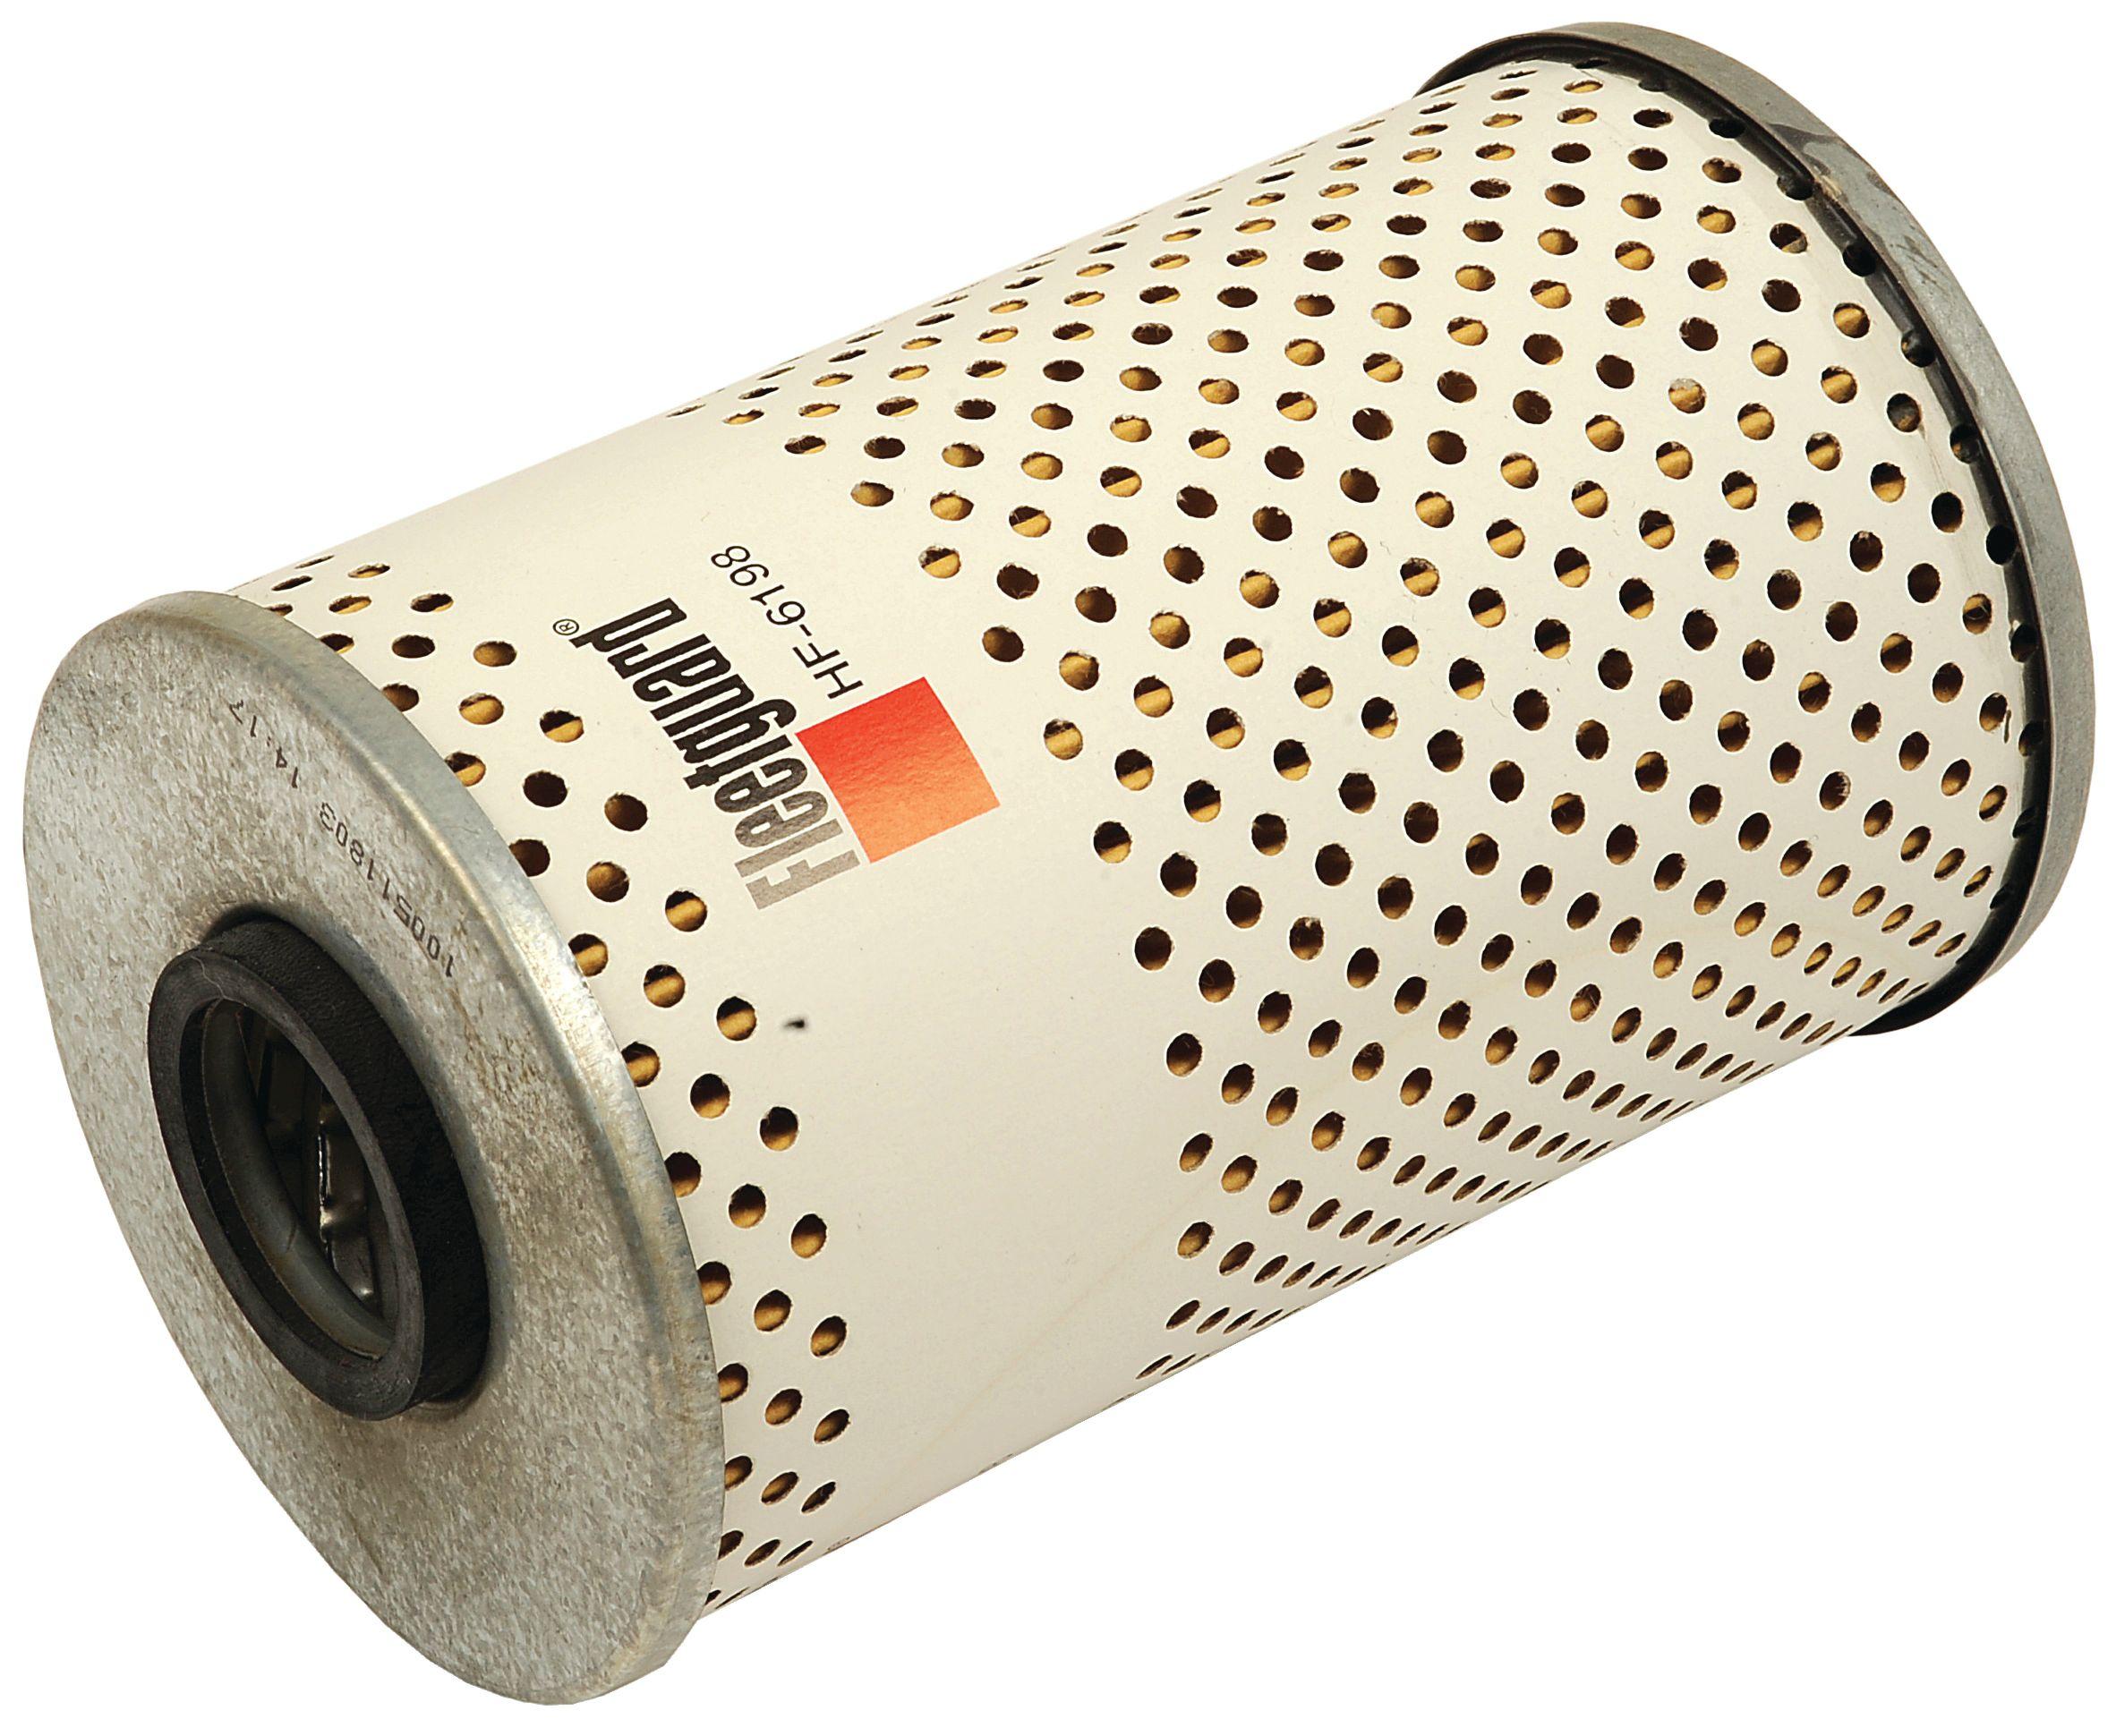 MATBRO HYDRAULIC FILTER HF6198 109302